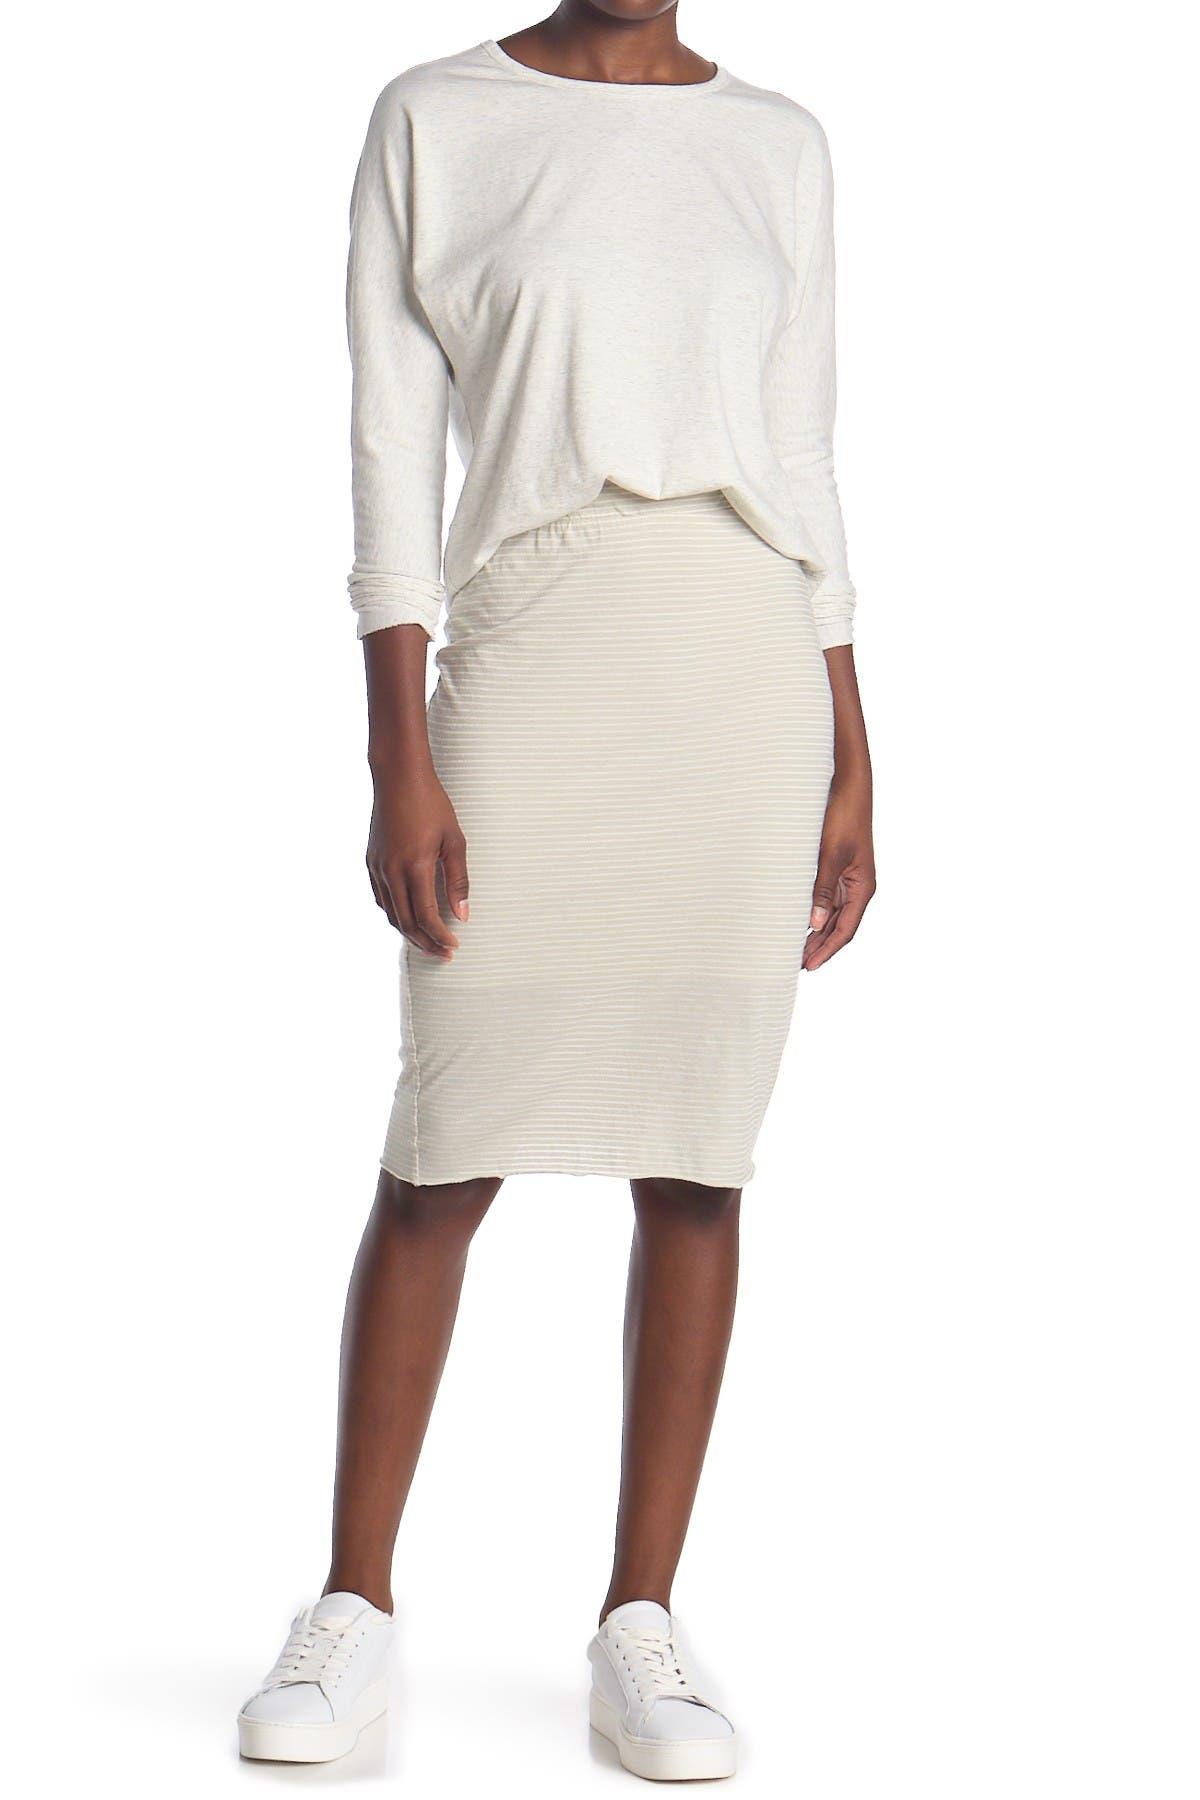 Image of FRANK & EILEEN Striped Jersey Tube Skirt